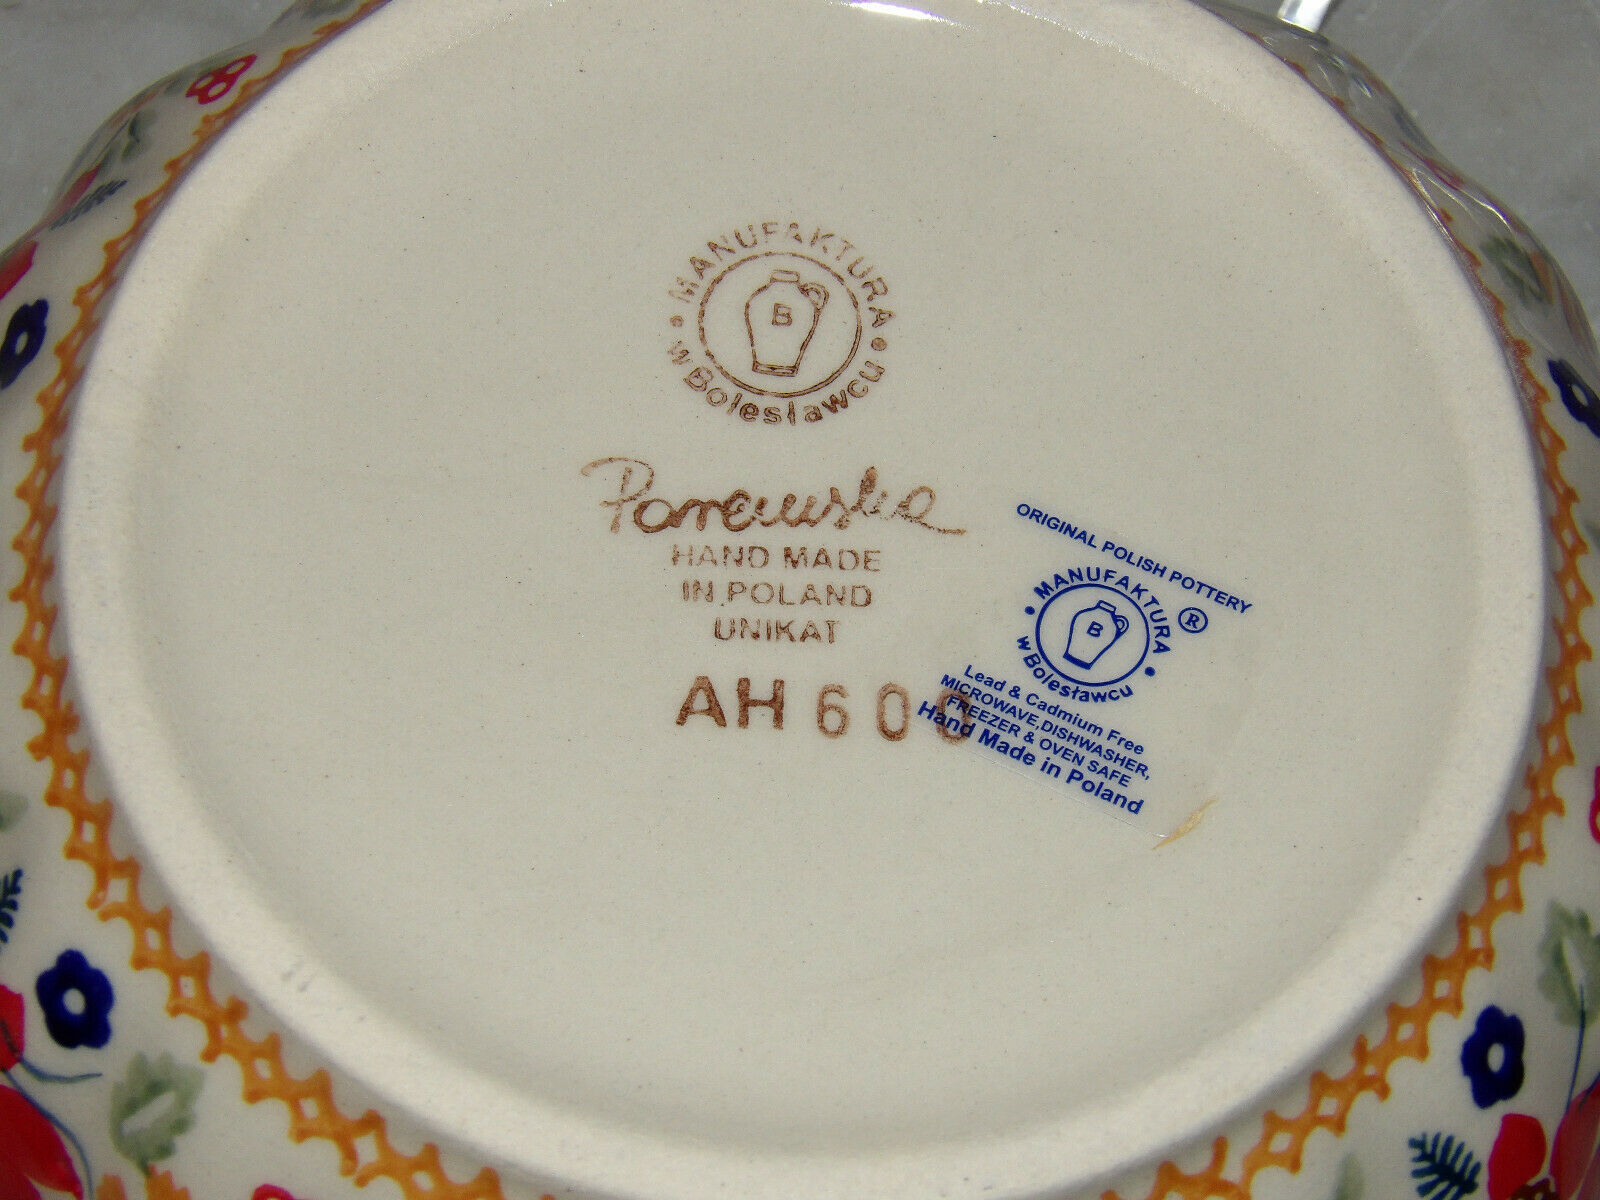 Polish Pottery Chip and Dip RelishTray /& Bowl UNIKAT Signature Rembrandt!